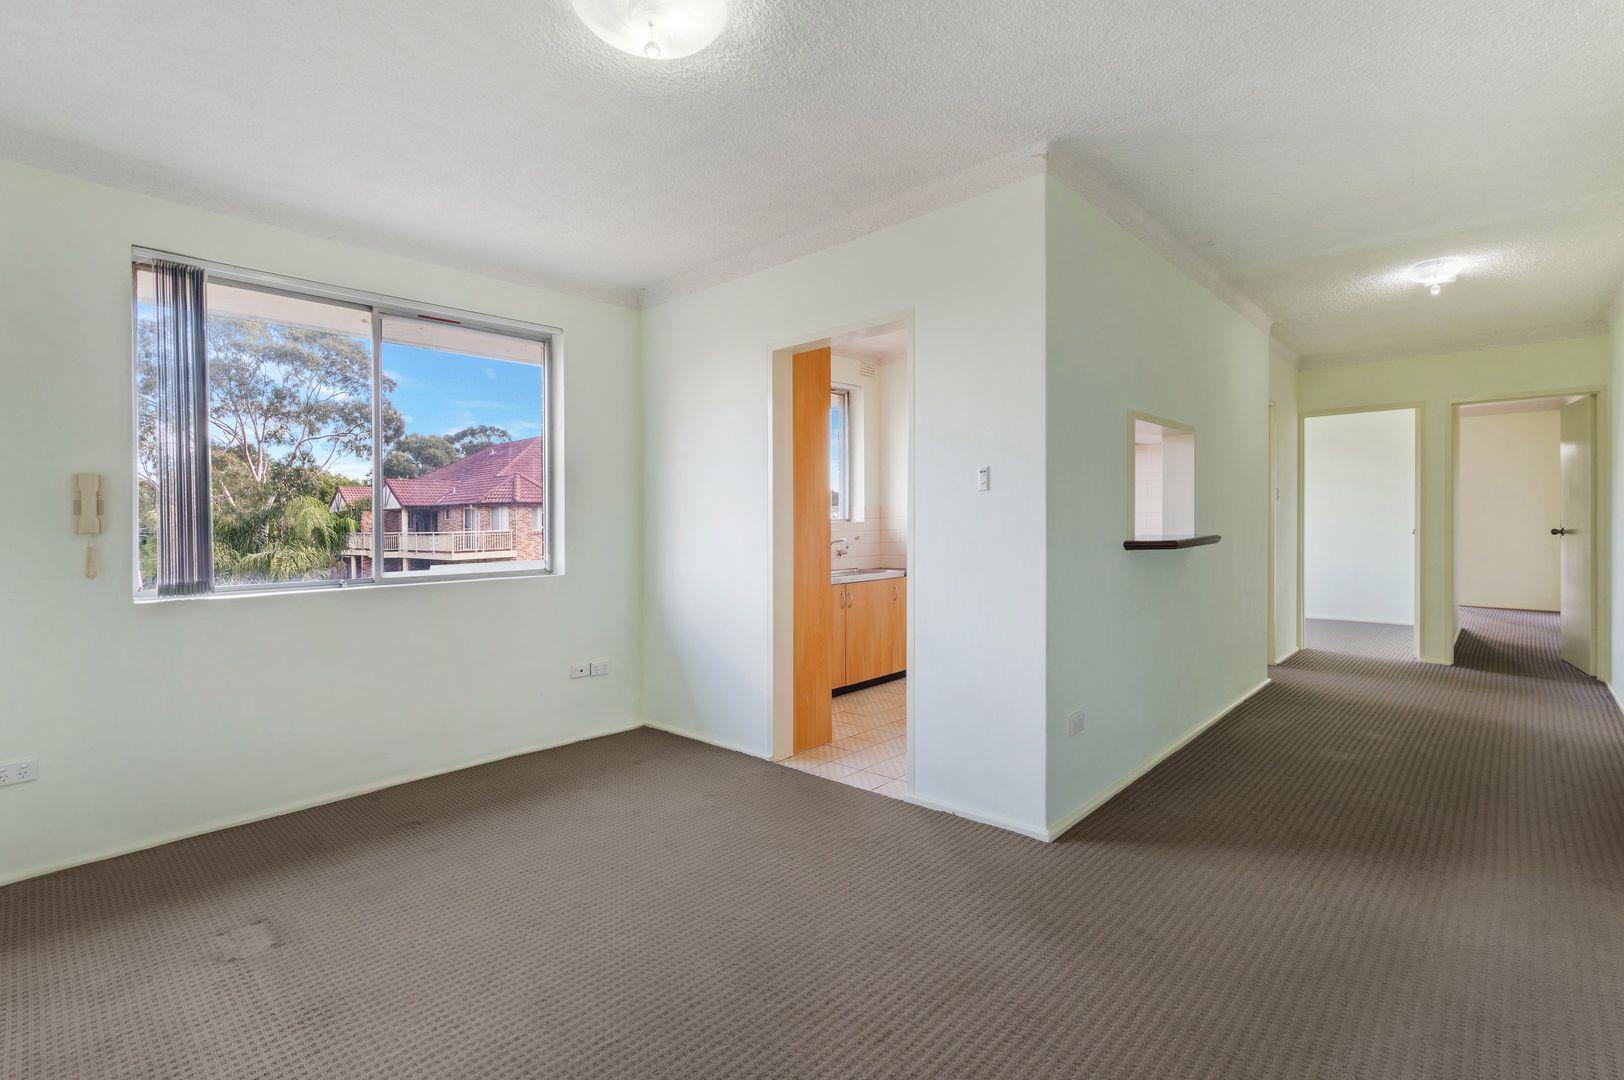 11/35 Carramar Avenue, Carramar NSW 2163, Image 1